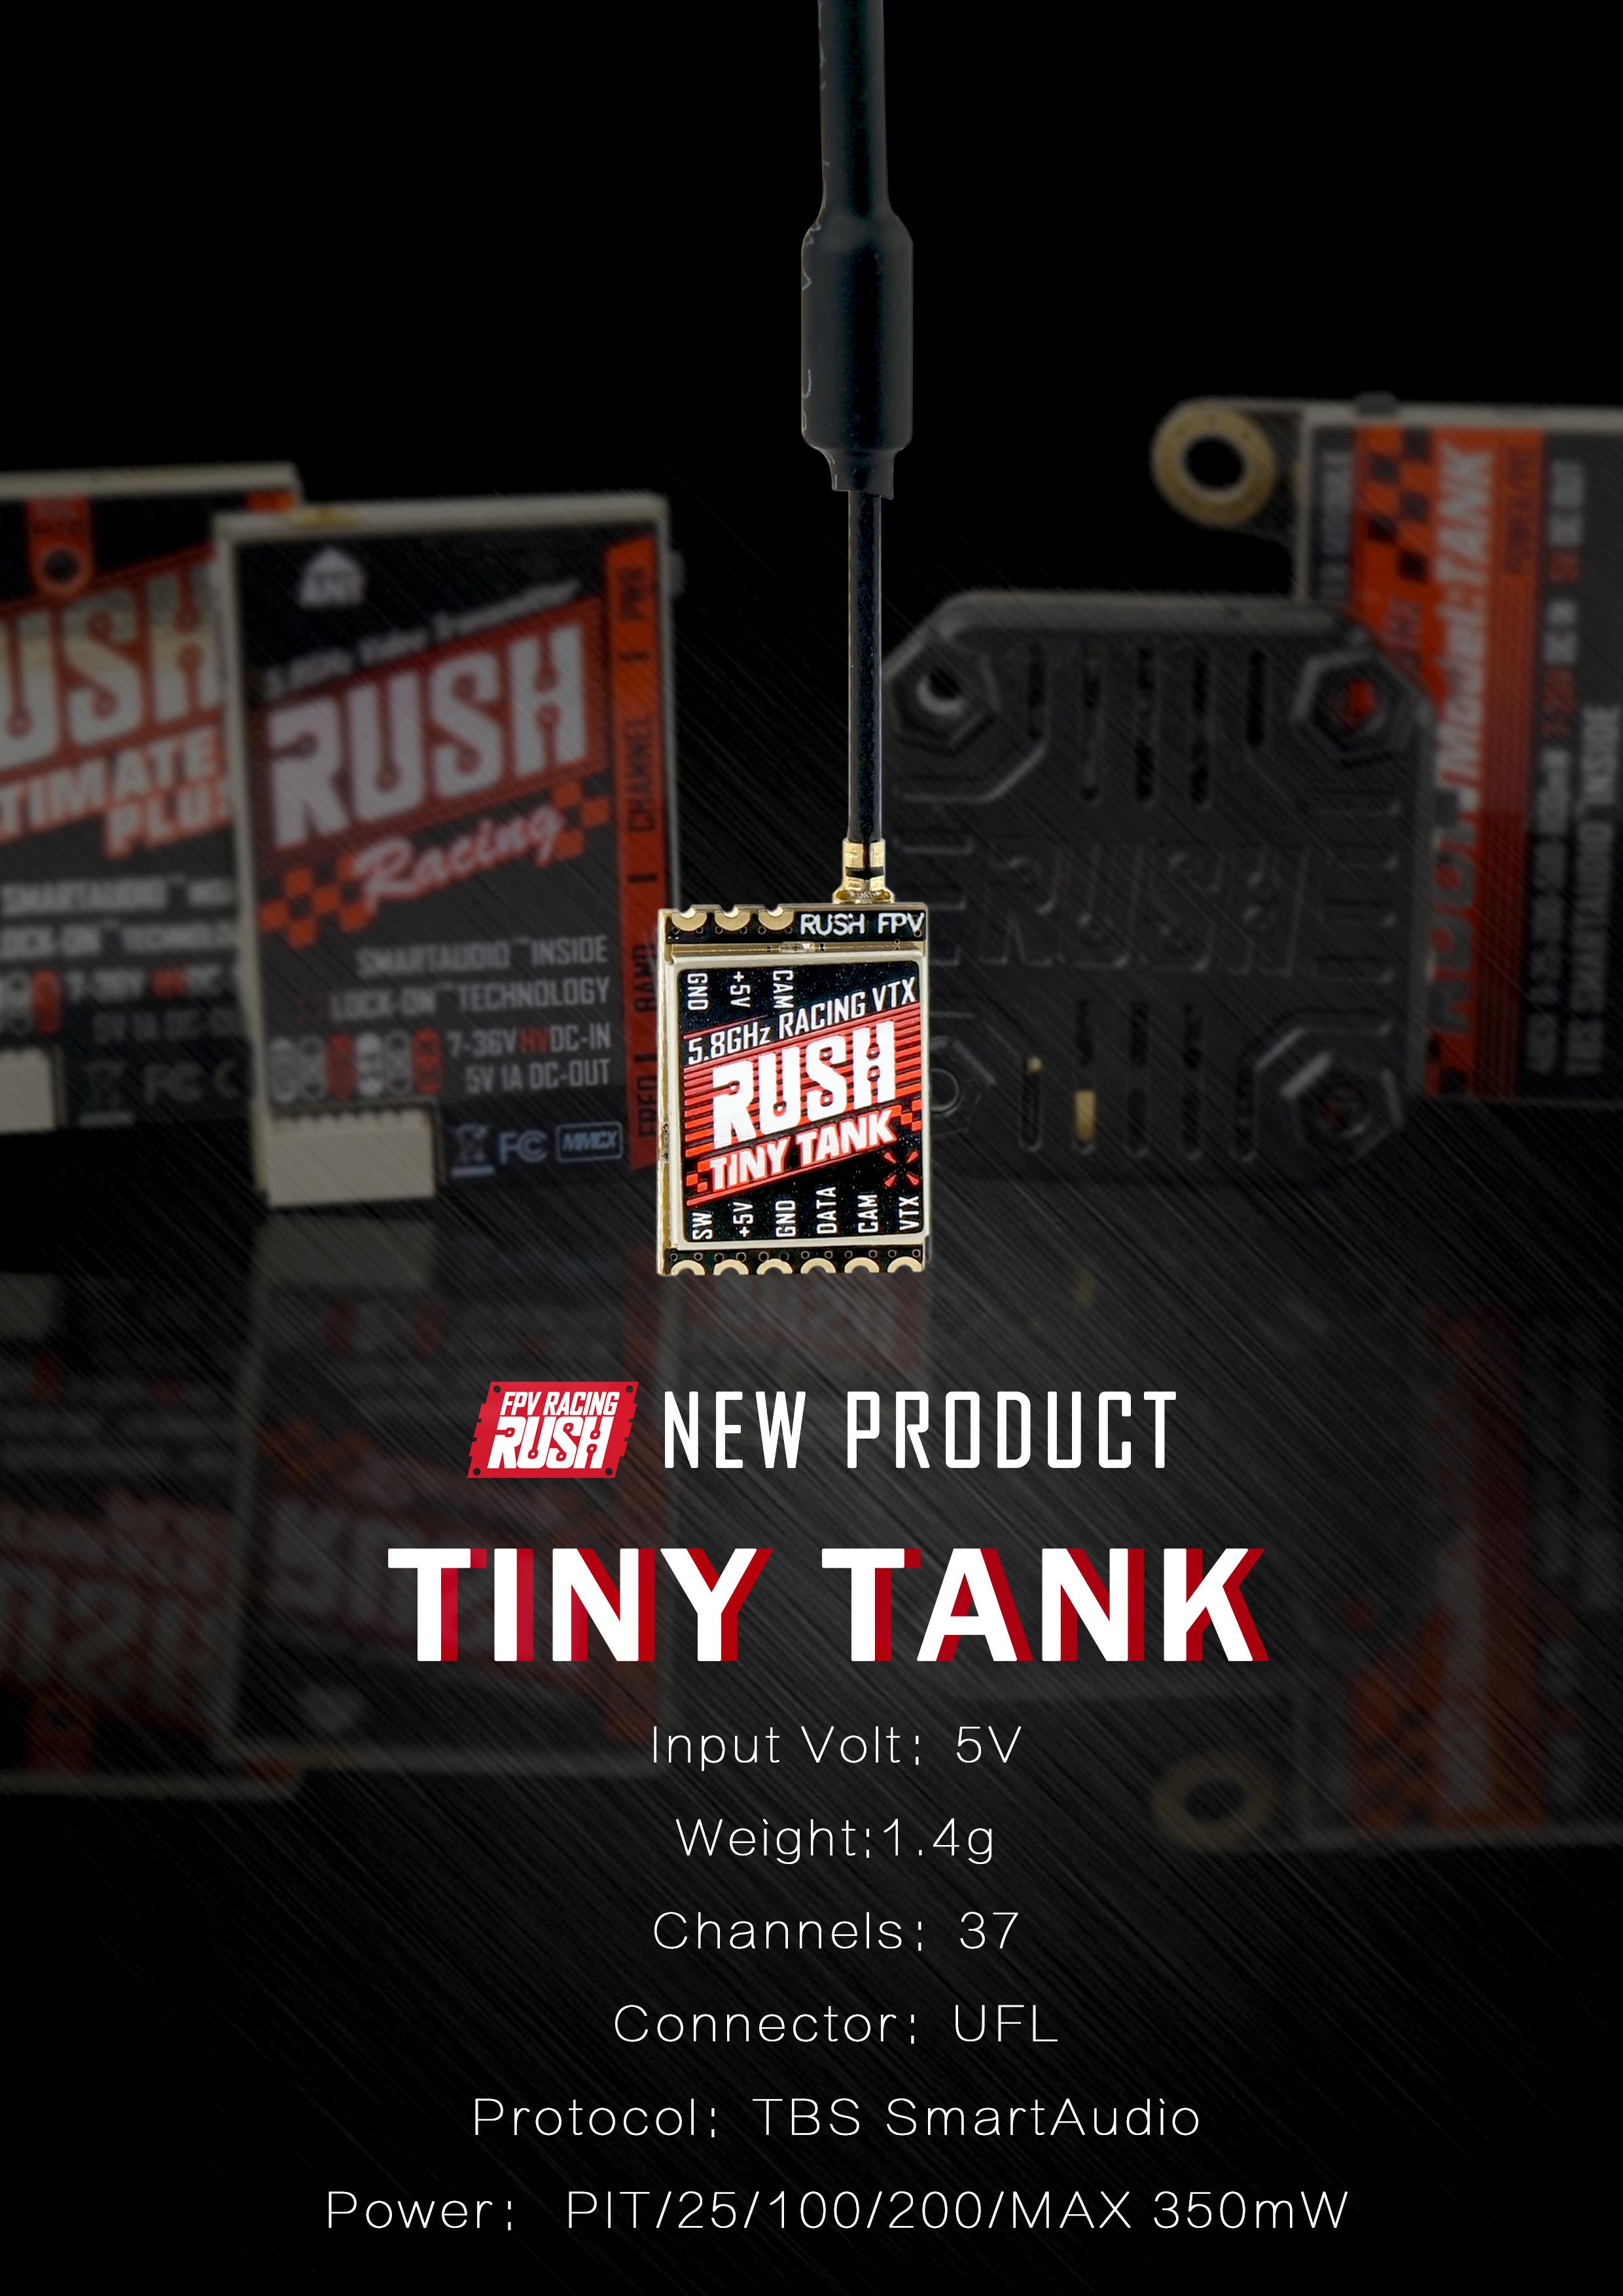 RUSH TANK TINY VTX 5.8G Smart Audio 0-25-100-200-350mW US VERSION